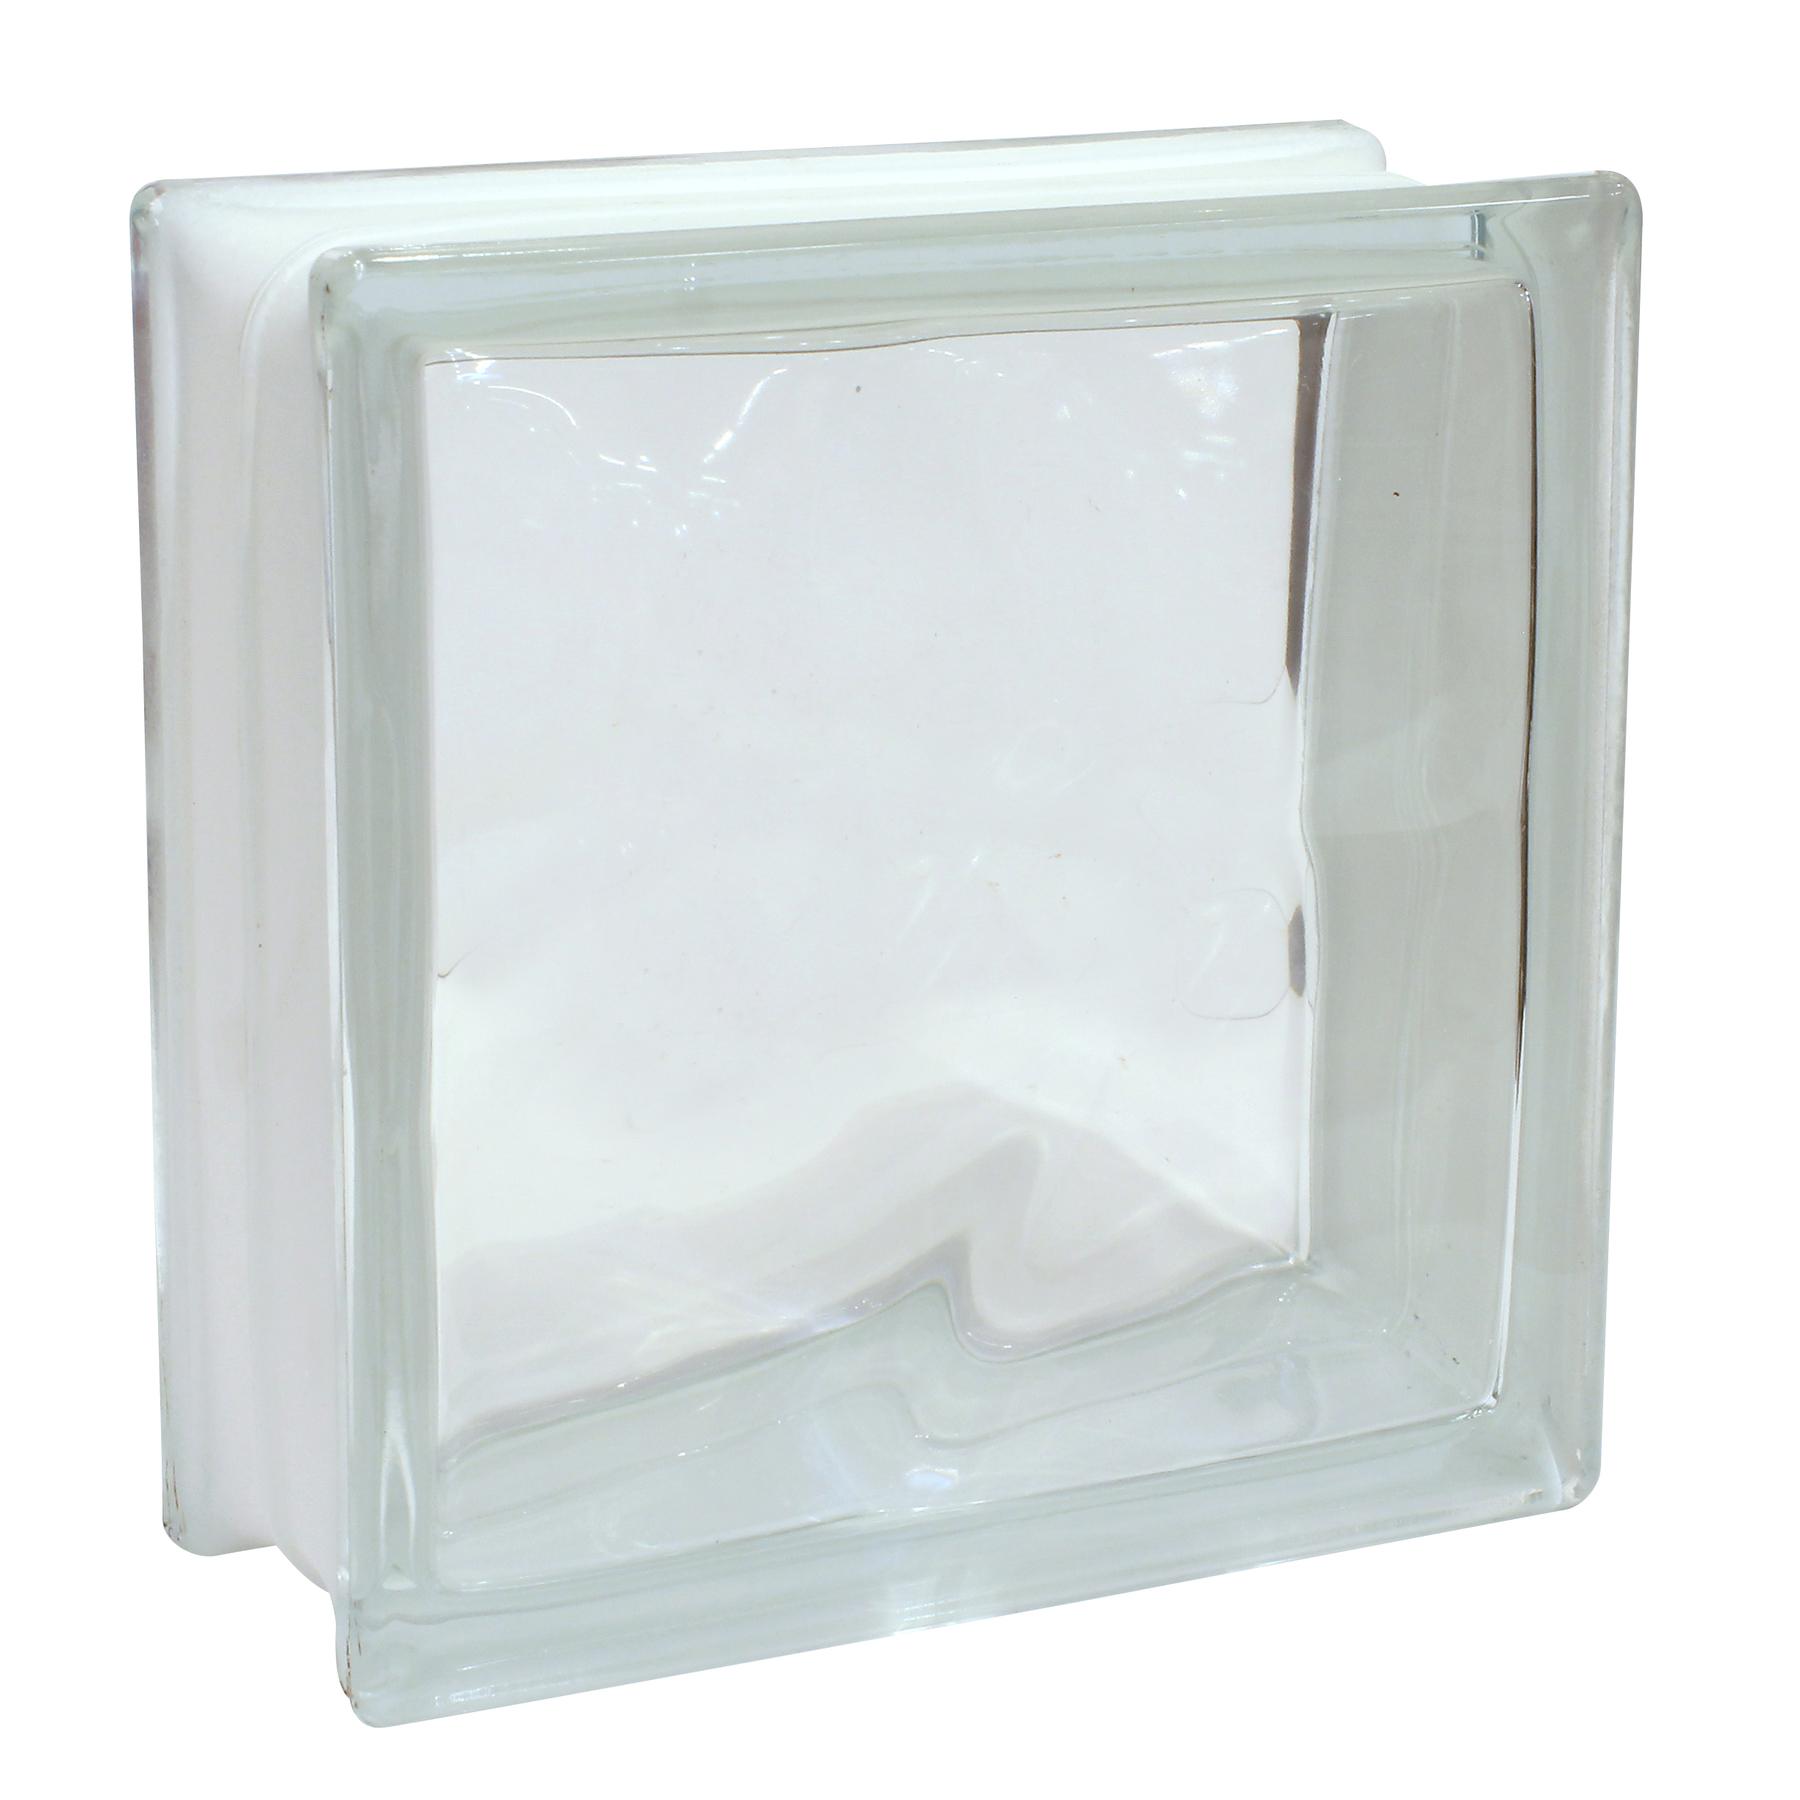 Blocos De Vidro Convencionais 10 Ofertas Imperd Veis Leroy Merlin -> Tijolo De Vidro Marrom